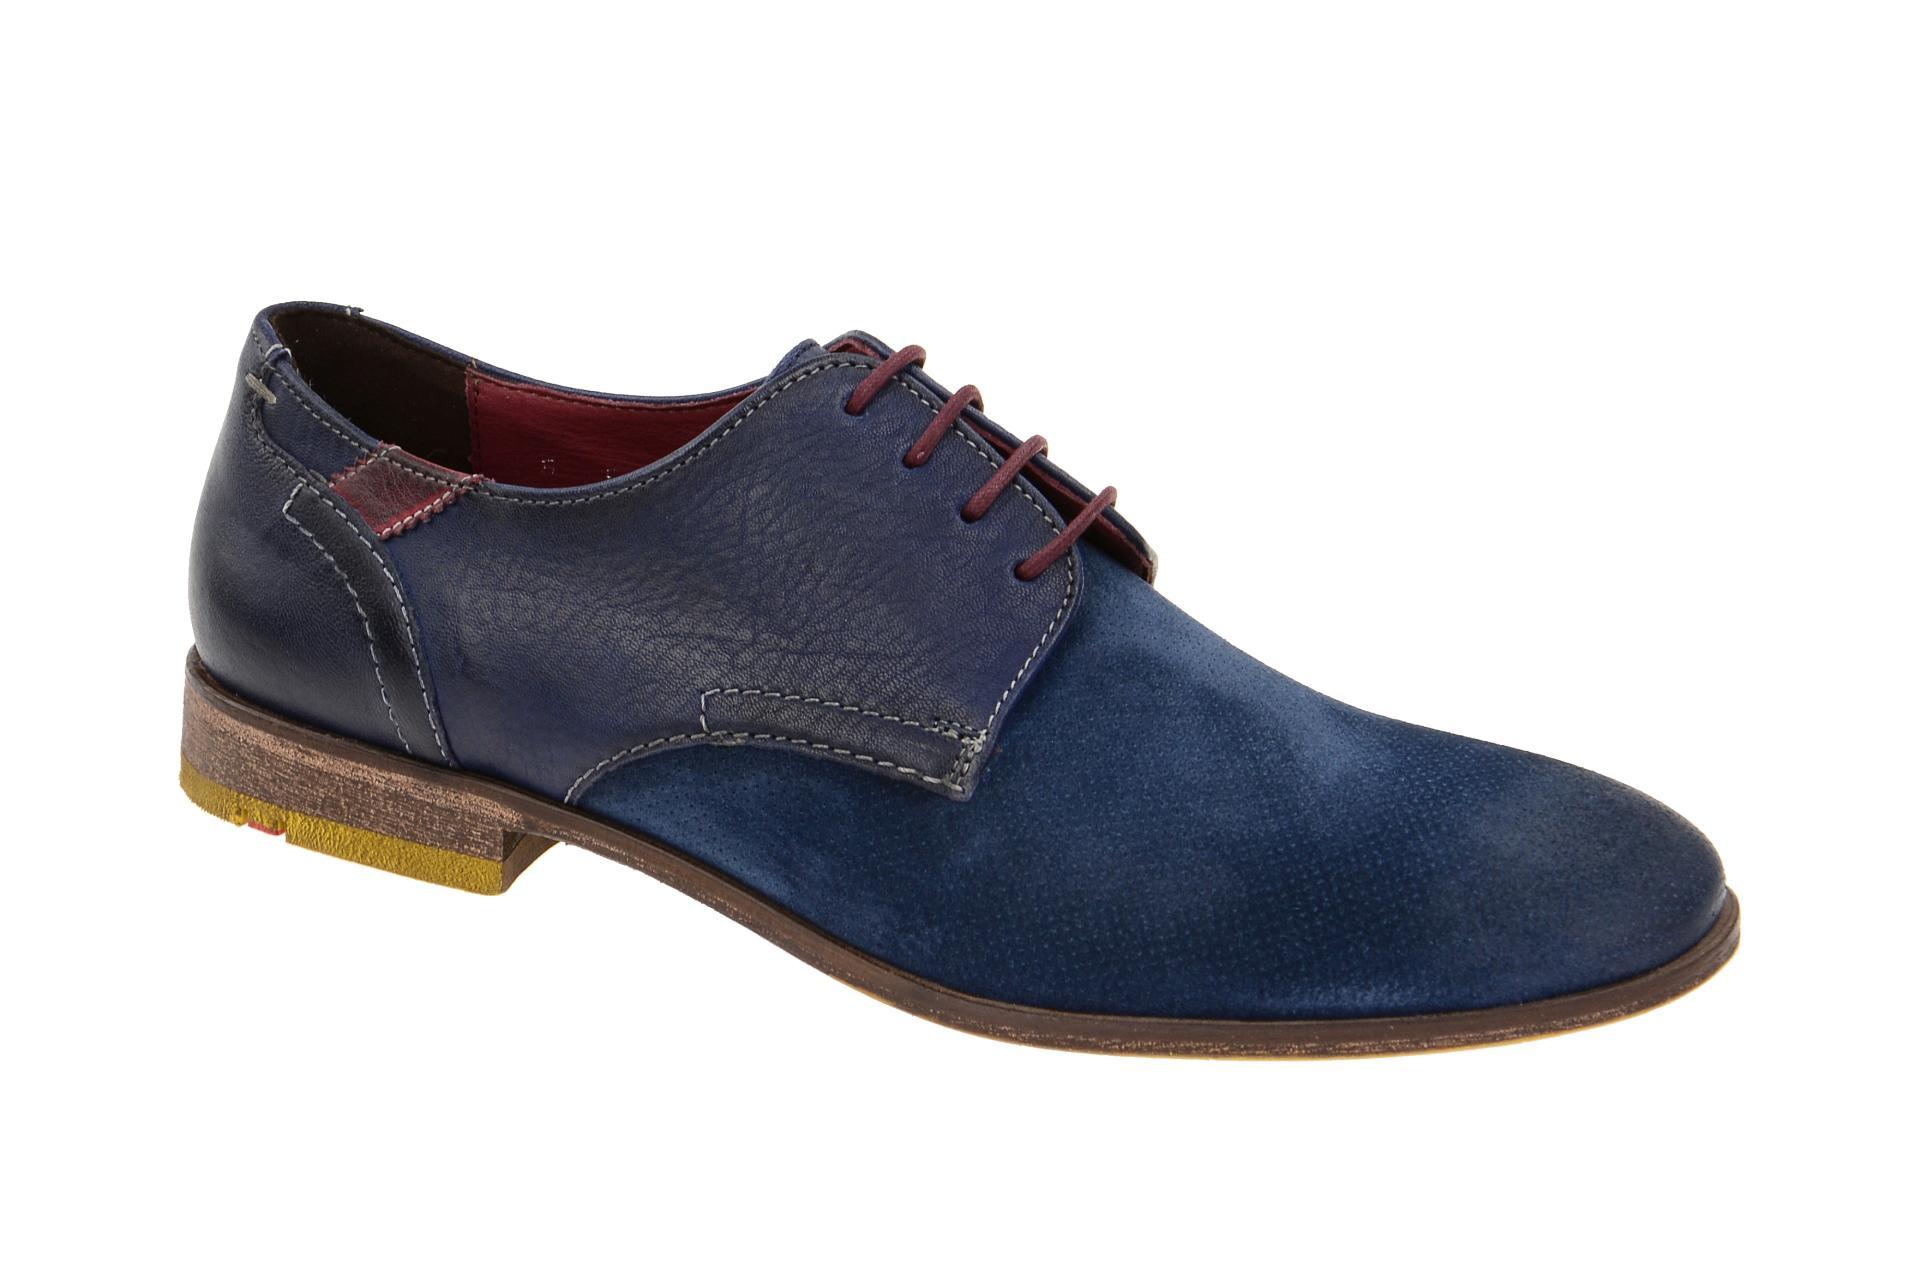 brand new c04c6 a8f53 Lloyd Gardell Schuhe blau jeans Business